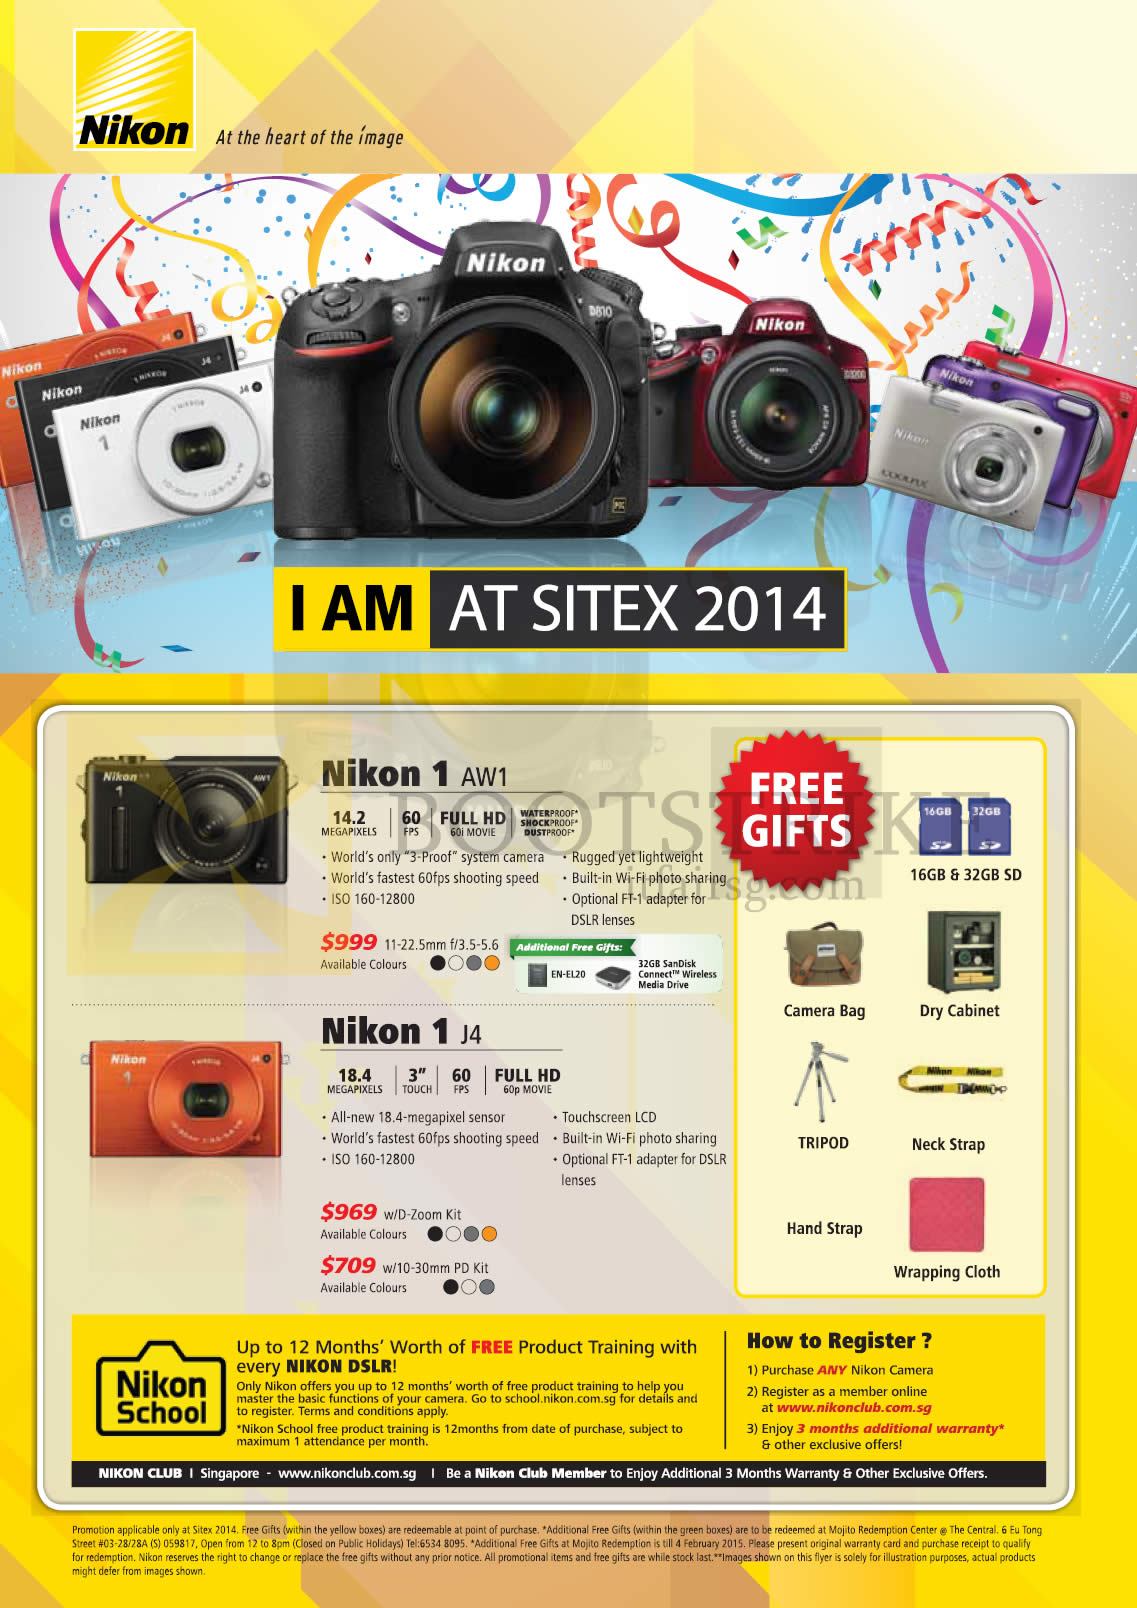 Nikon Digital Cameras Coolpix P7800, P530, L330, S6700, S2800, L29, P600, AW120, S6900